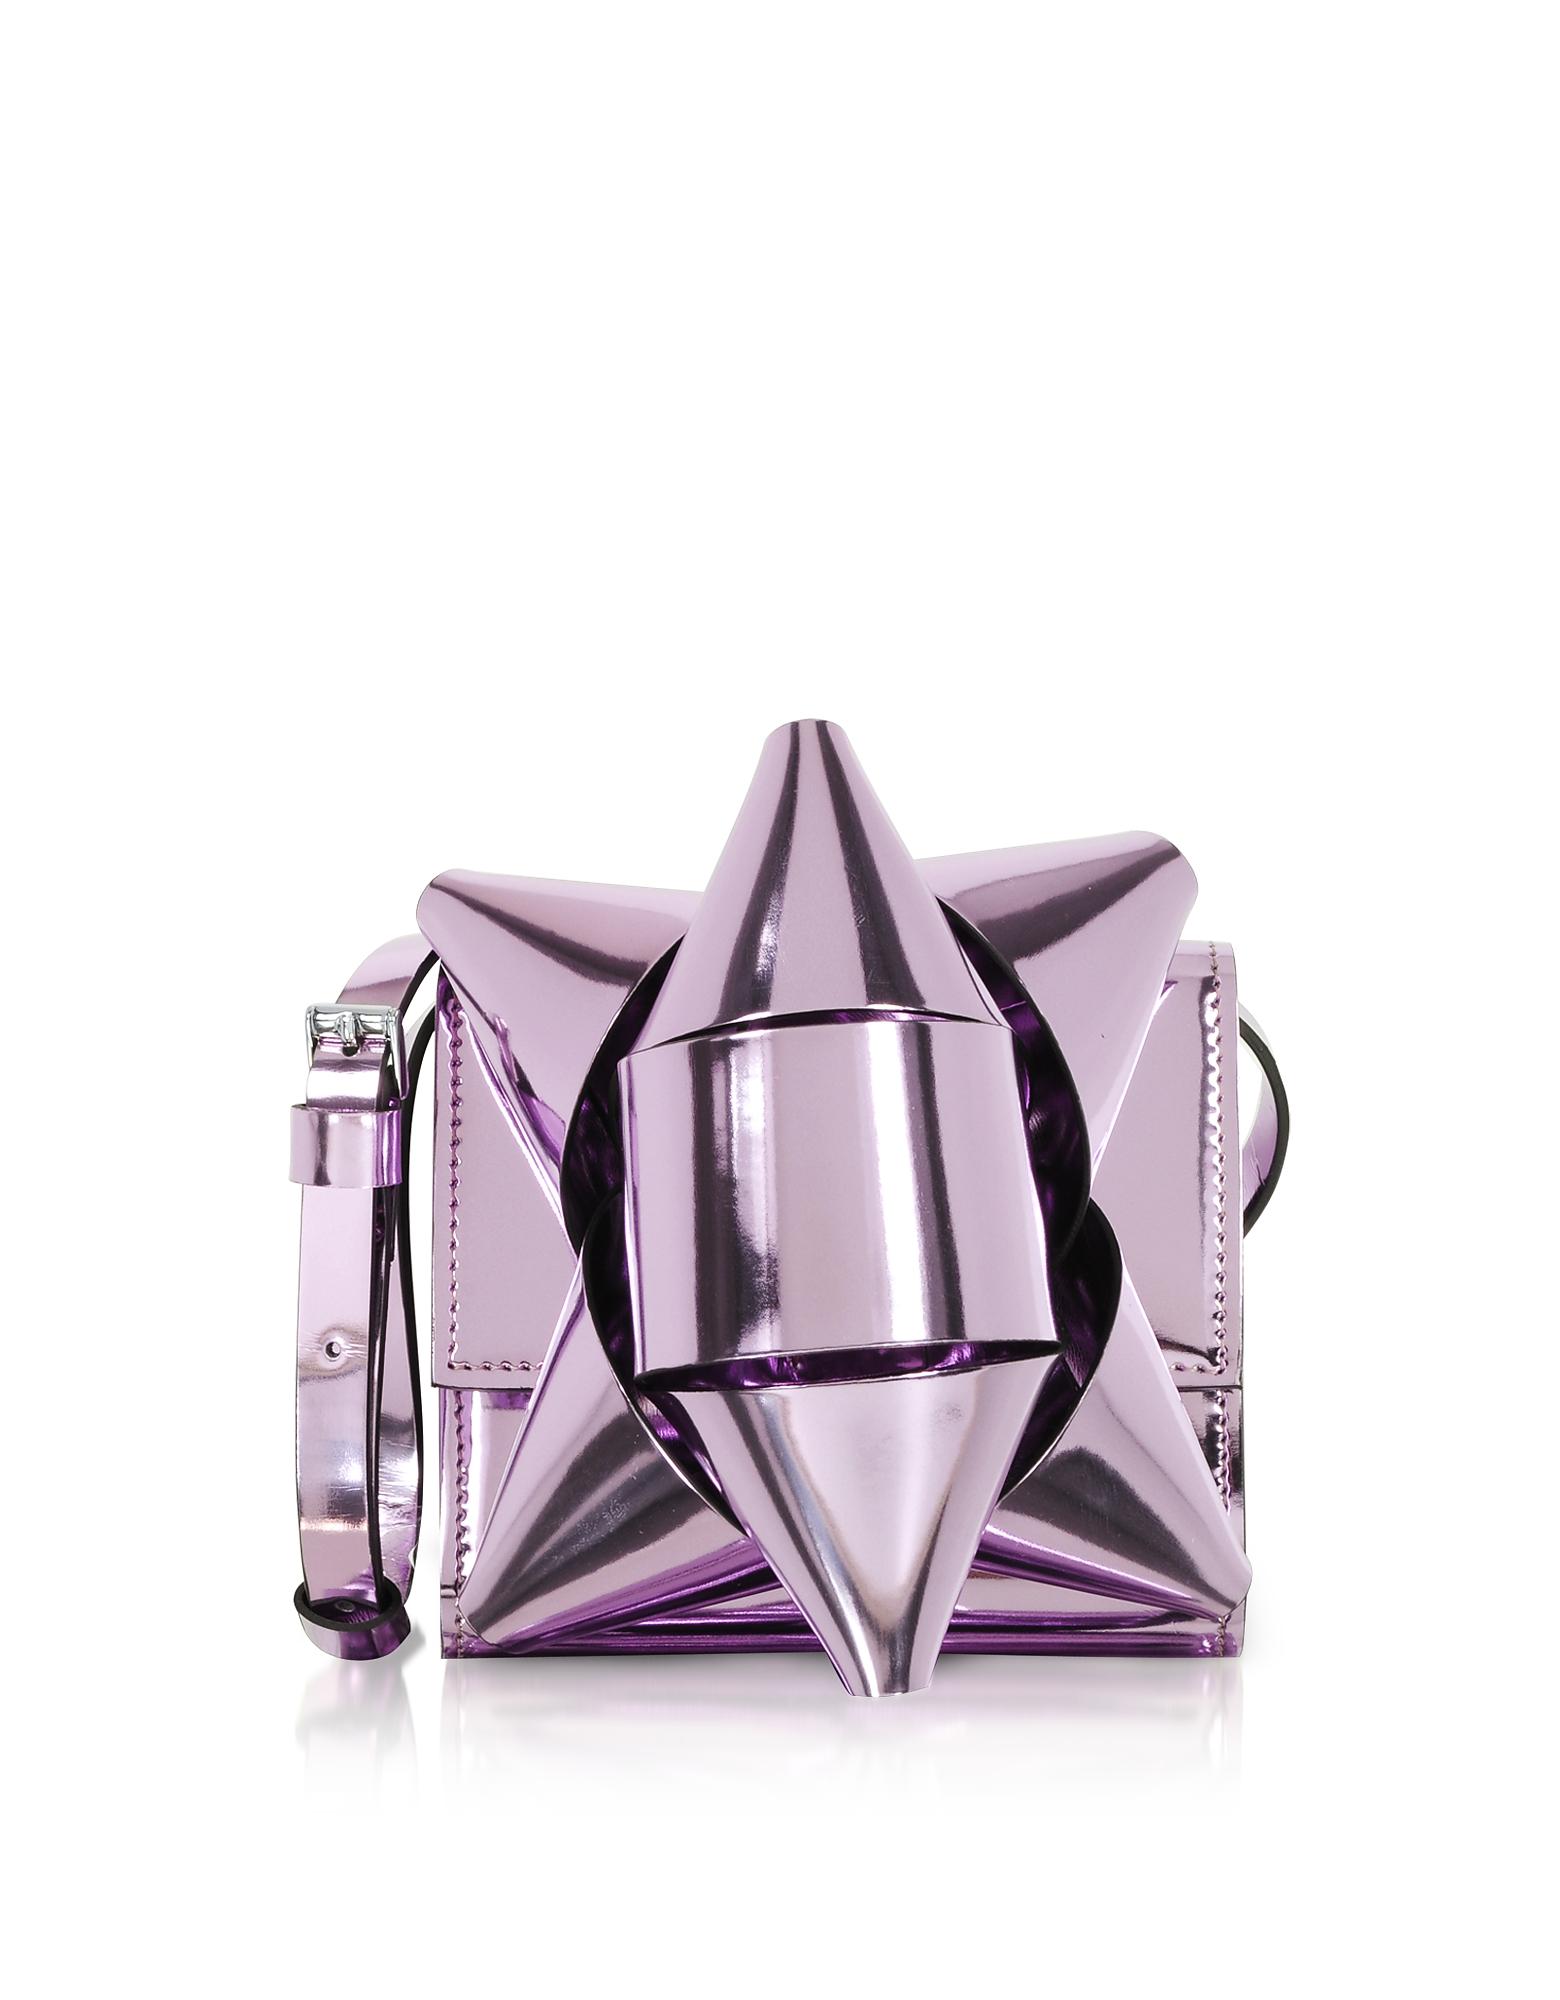 MM6 Maison Martin Margiela Handbags, Metallic Eco-Leather Bow Shoulder Bag